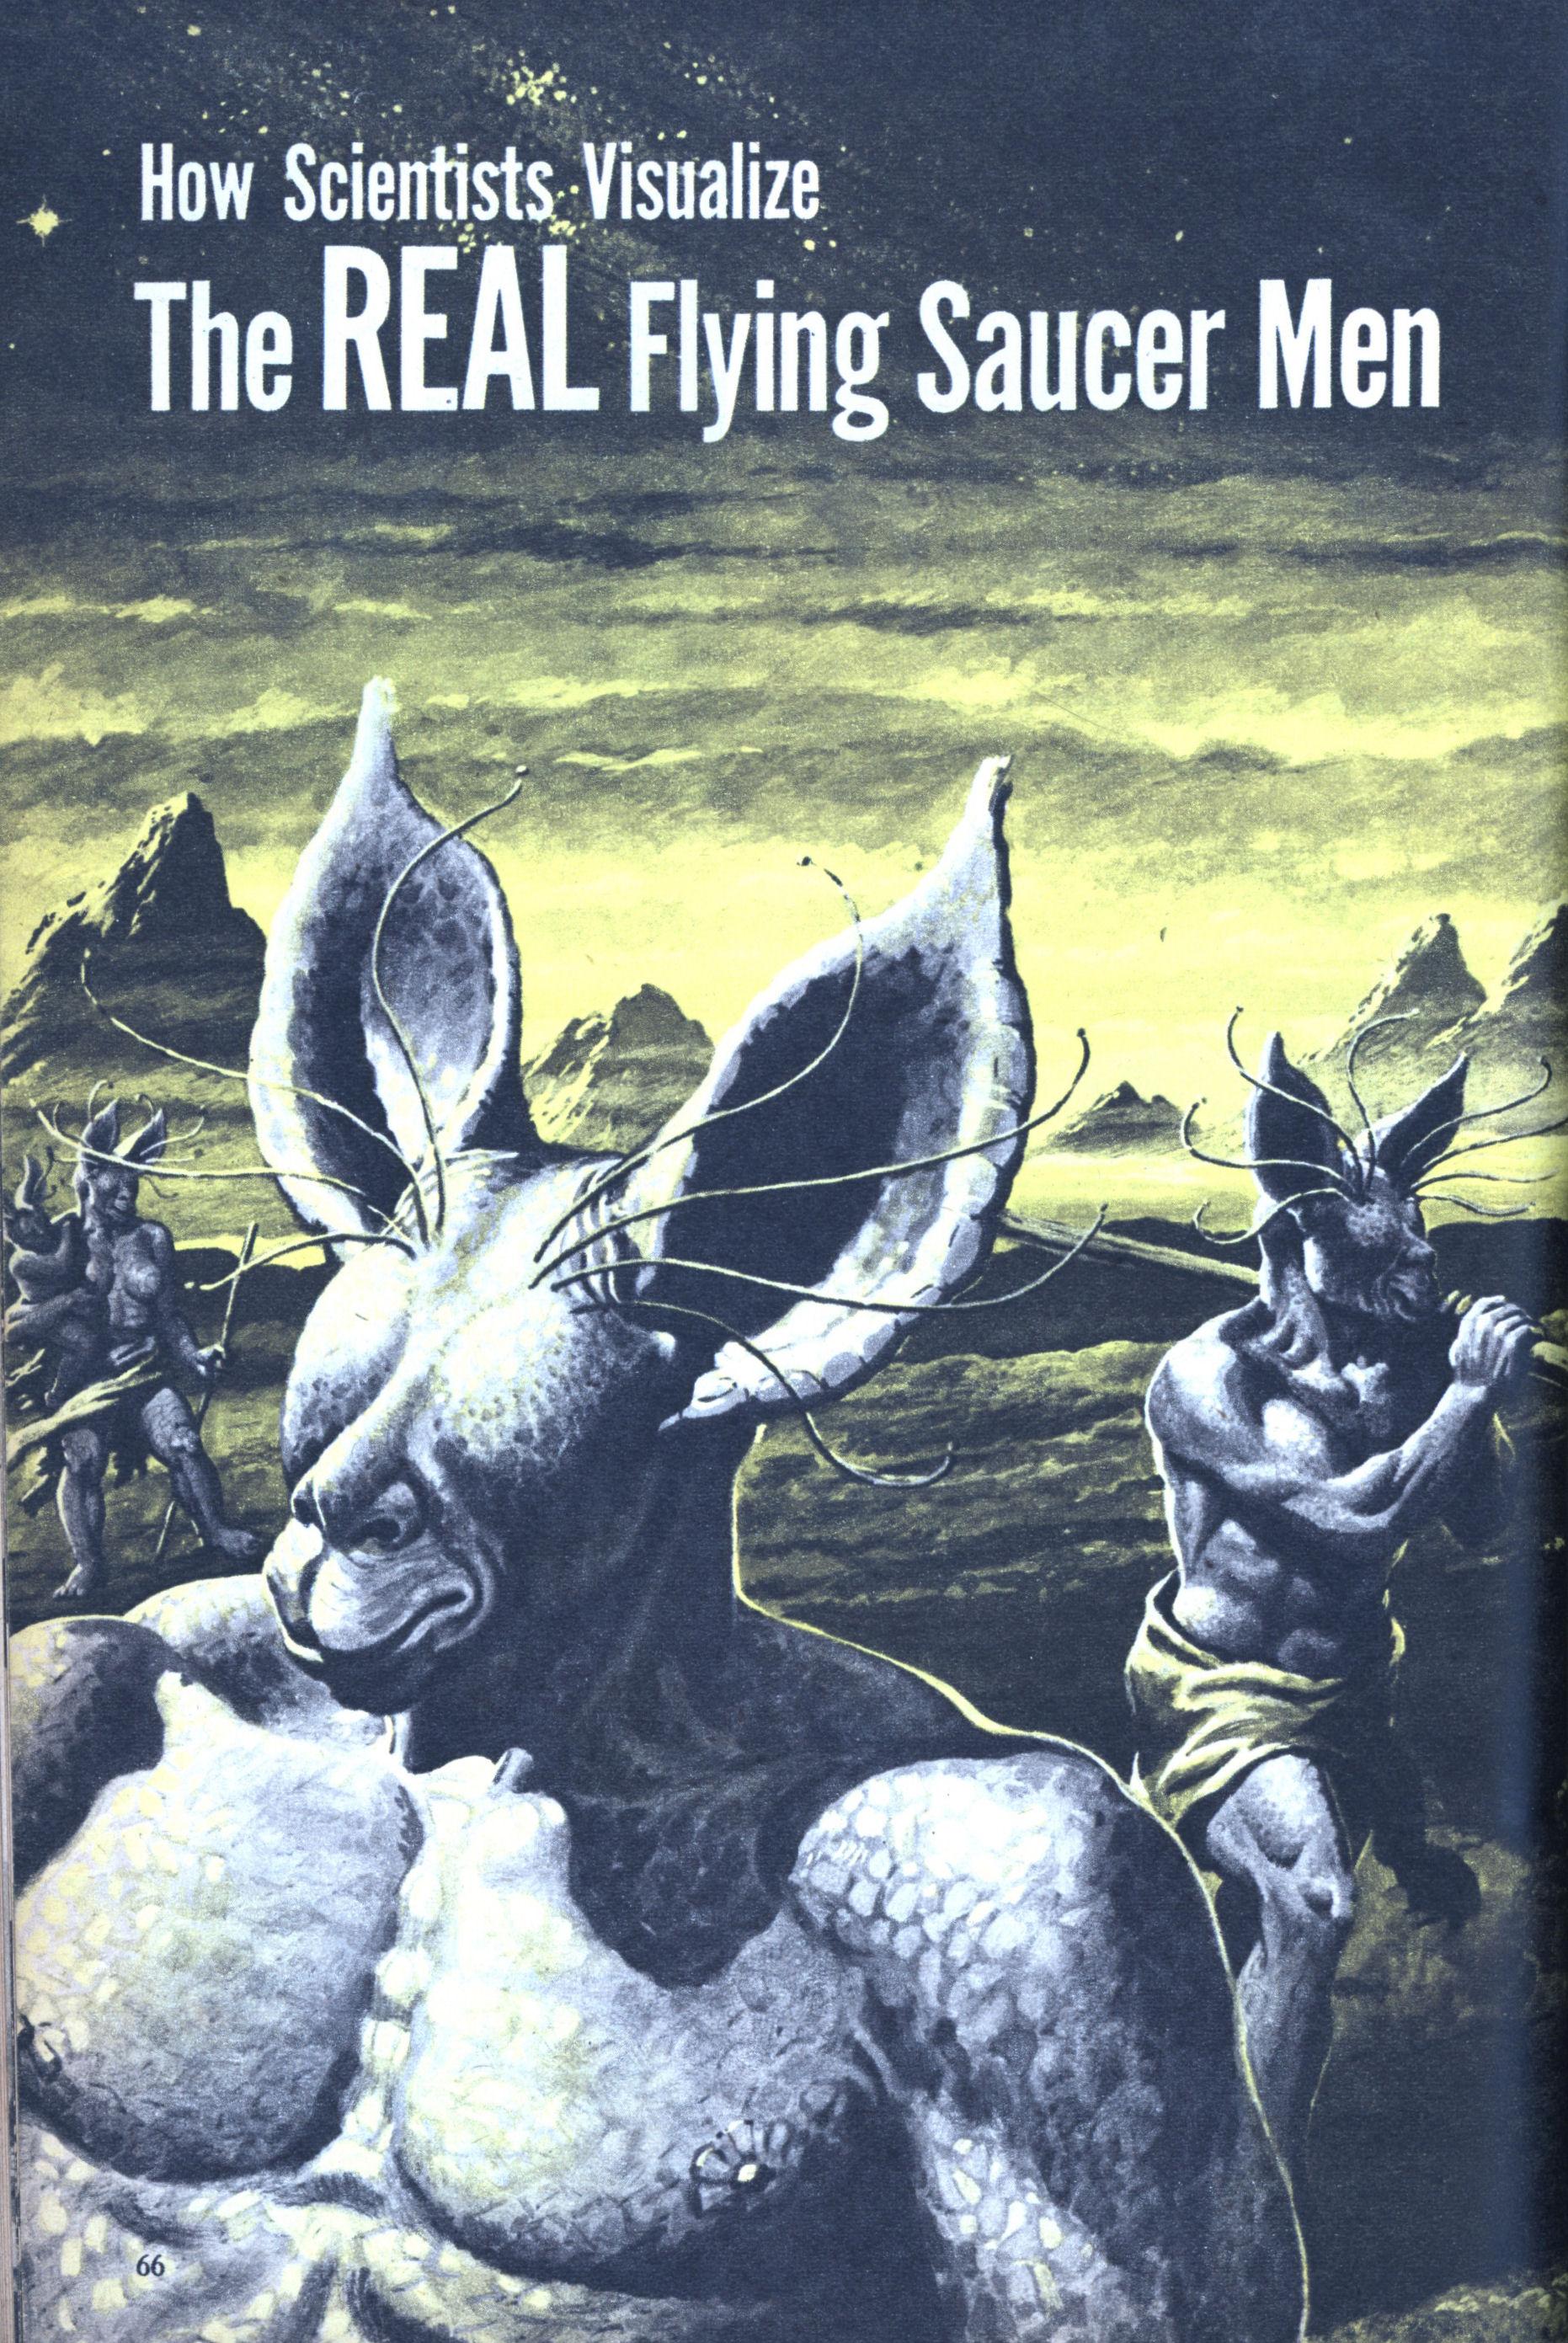 How Scientists Visualize the REAL Flying Saucer Men Flying_saucer_men_0